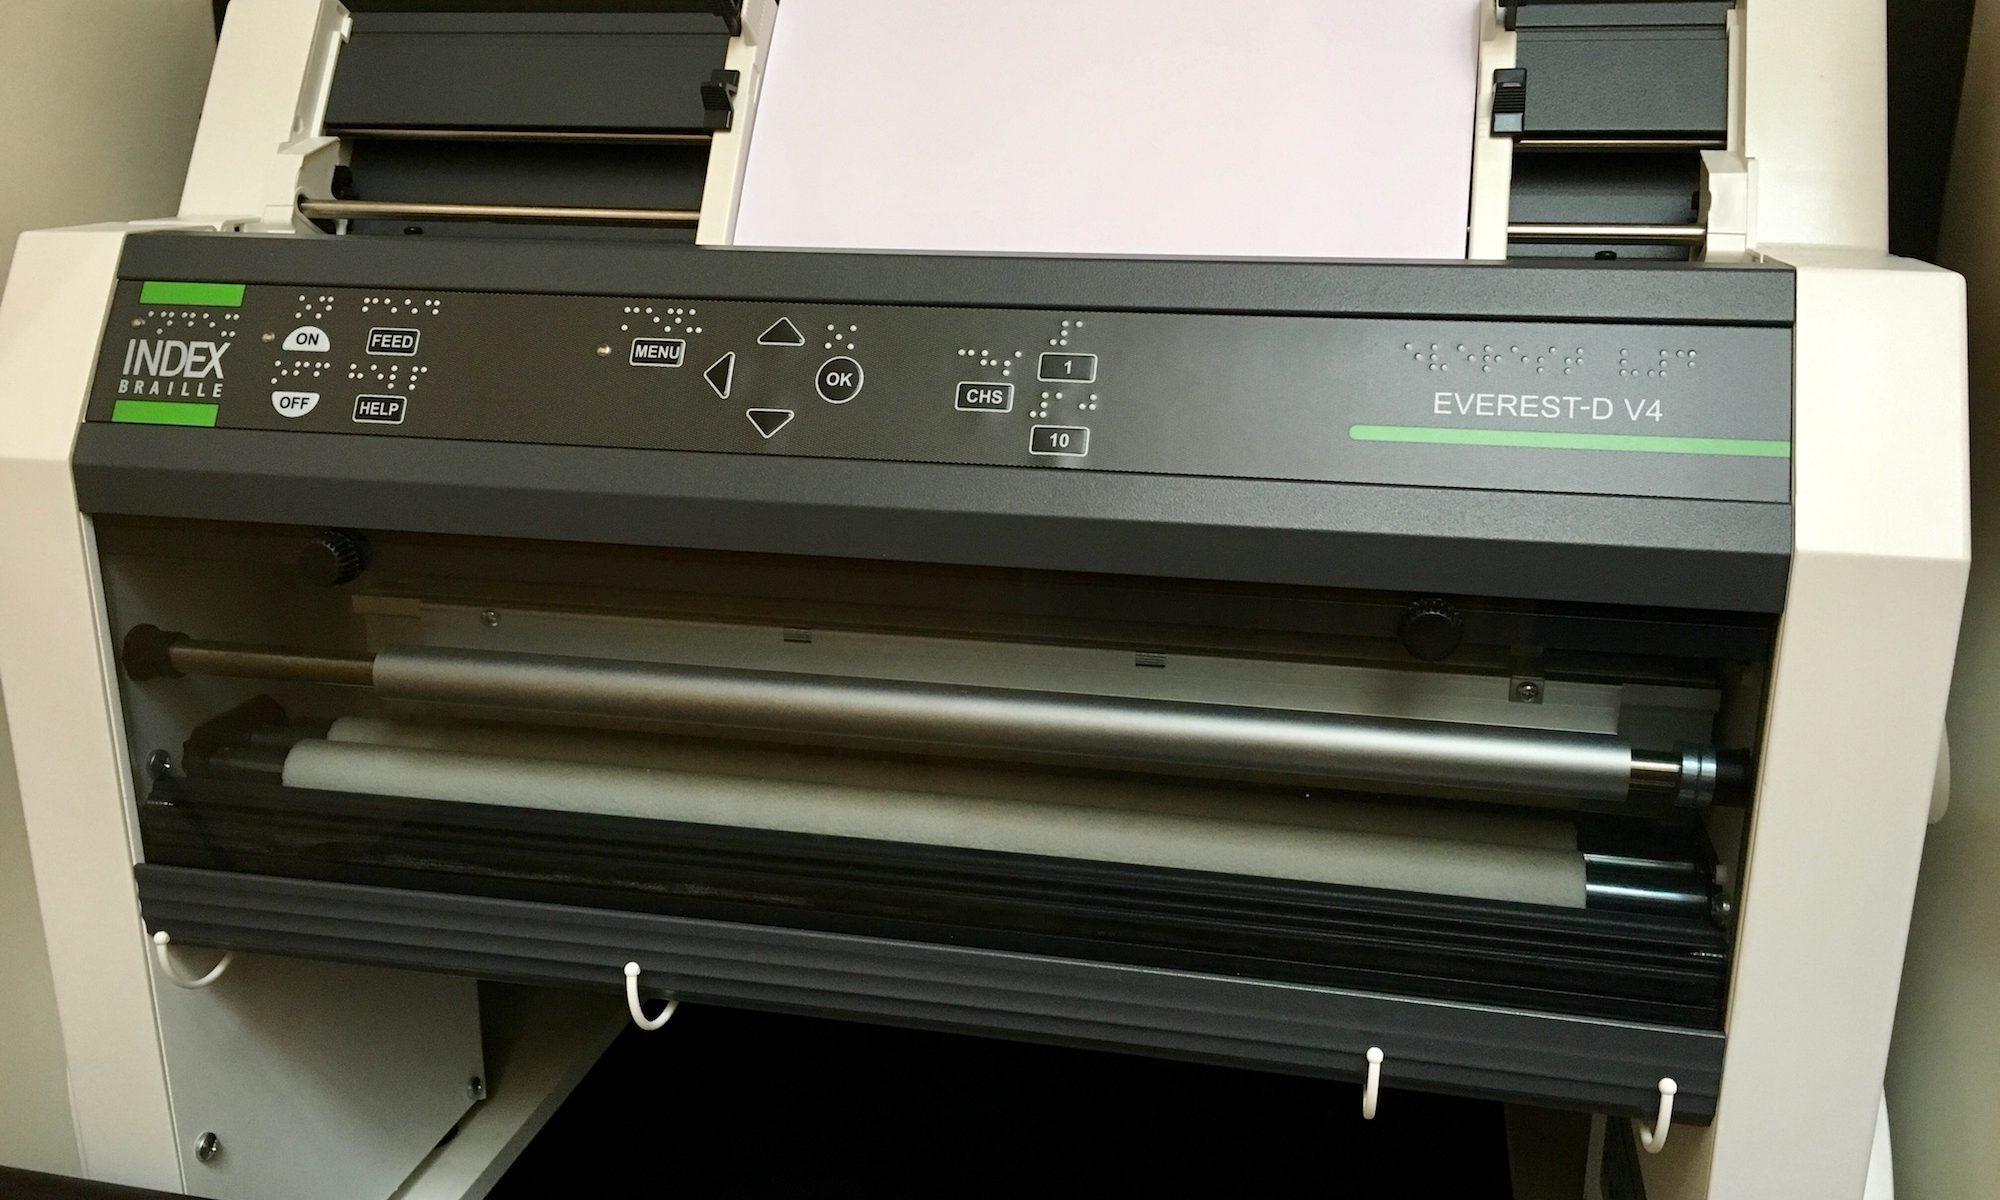 Brailledrucker index everest v4